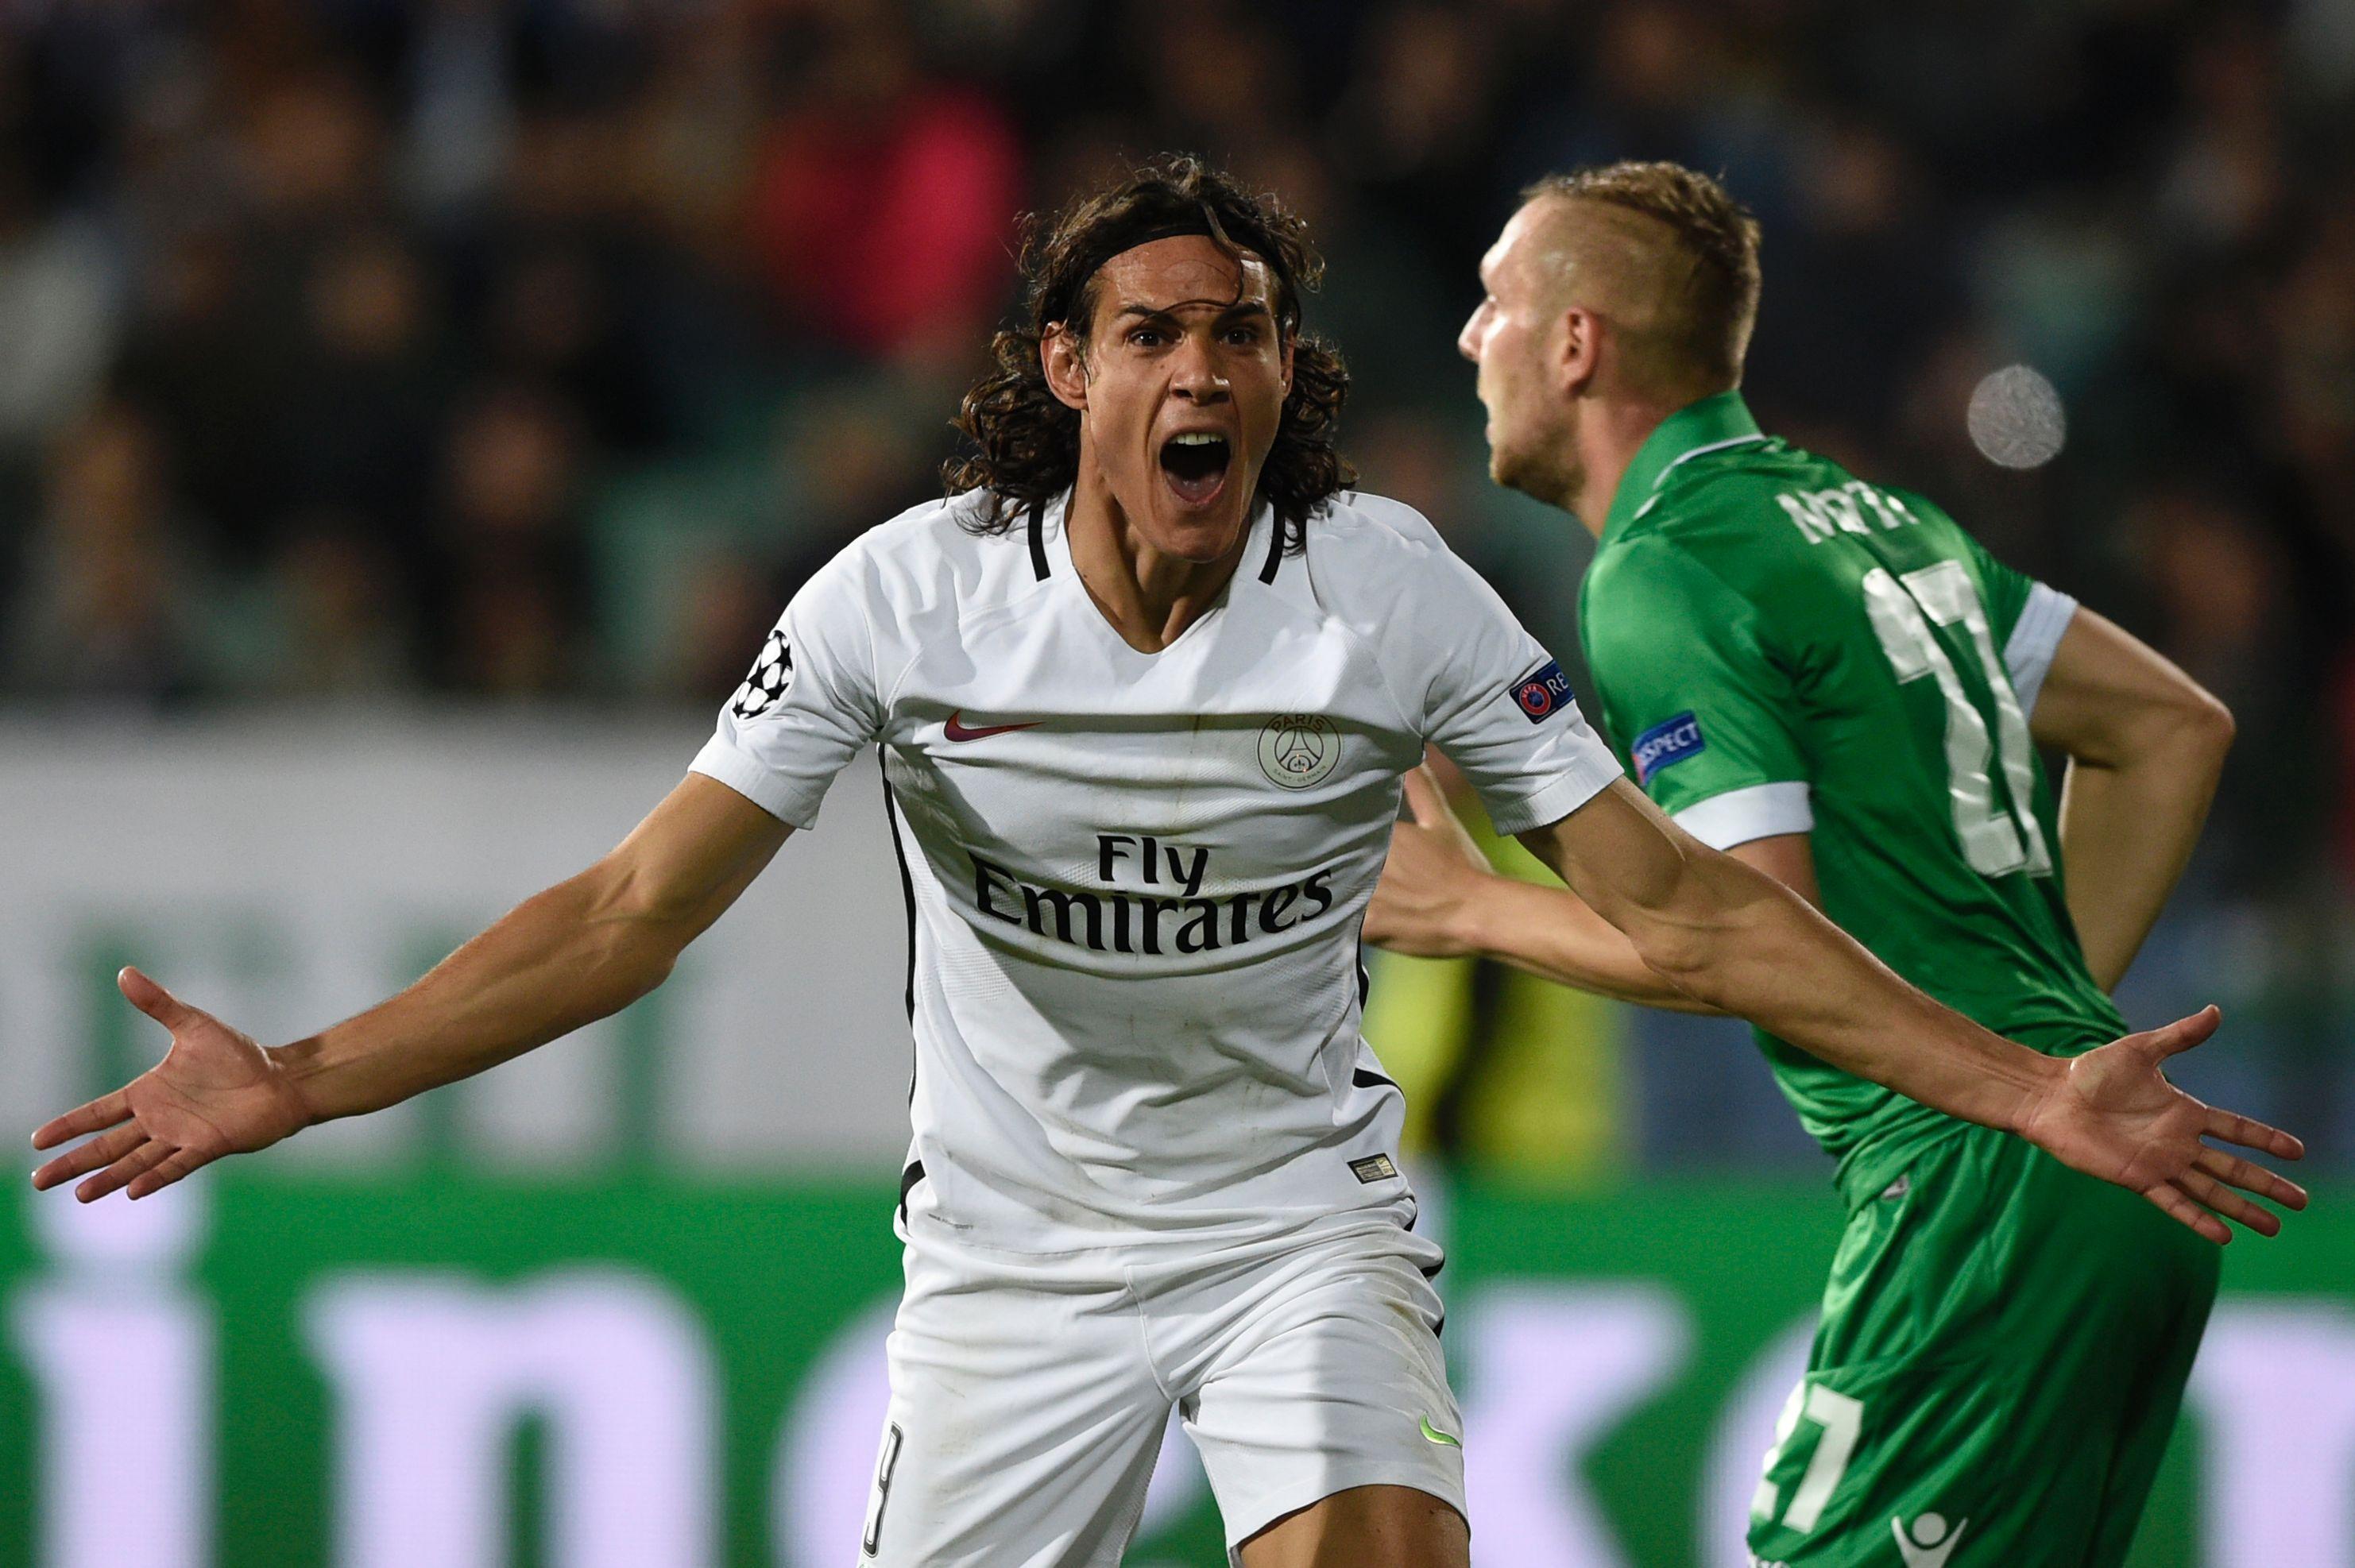 Football - Penalty, doublé, frayeur : Ludogorets-PSG en huit photos